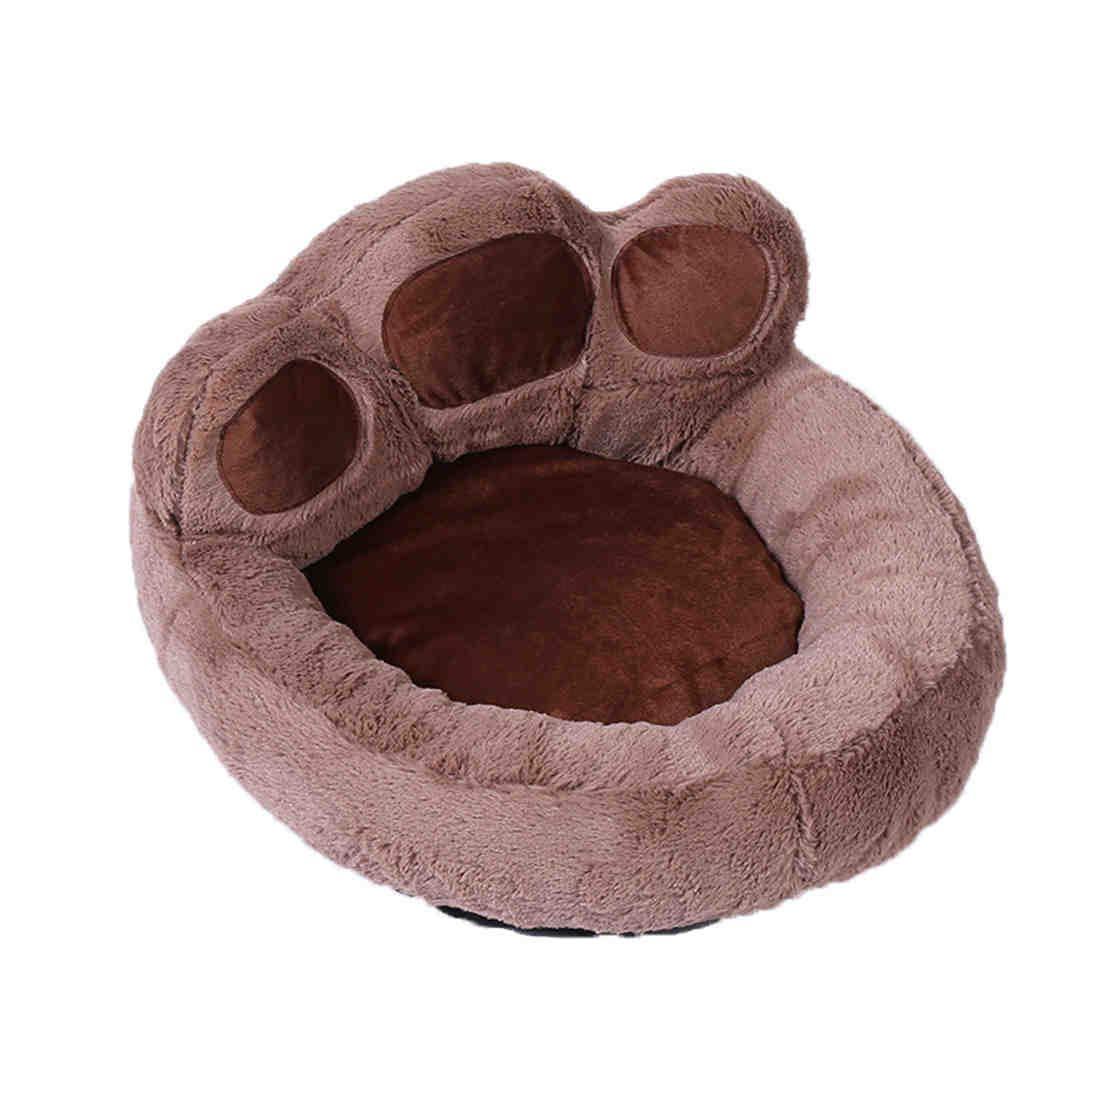 Small Cute Short Velvet Kennel Foot Shape Dog Bed Soft Dog Sofa Detachable Washable Dirt Resistant Bite Resistance Brown  3 Sizes